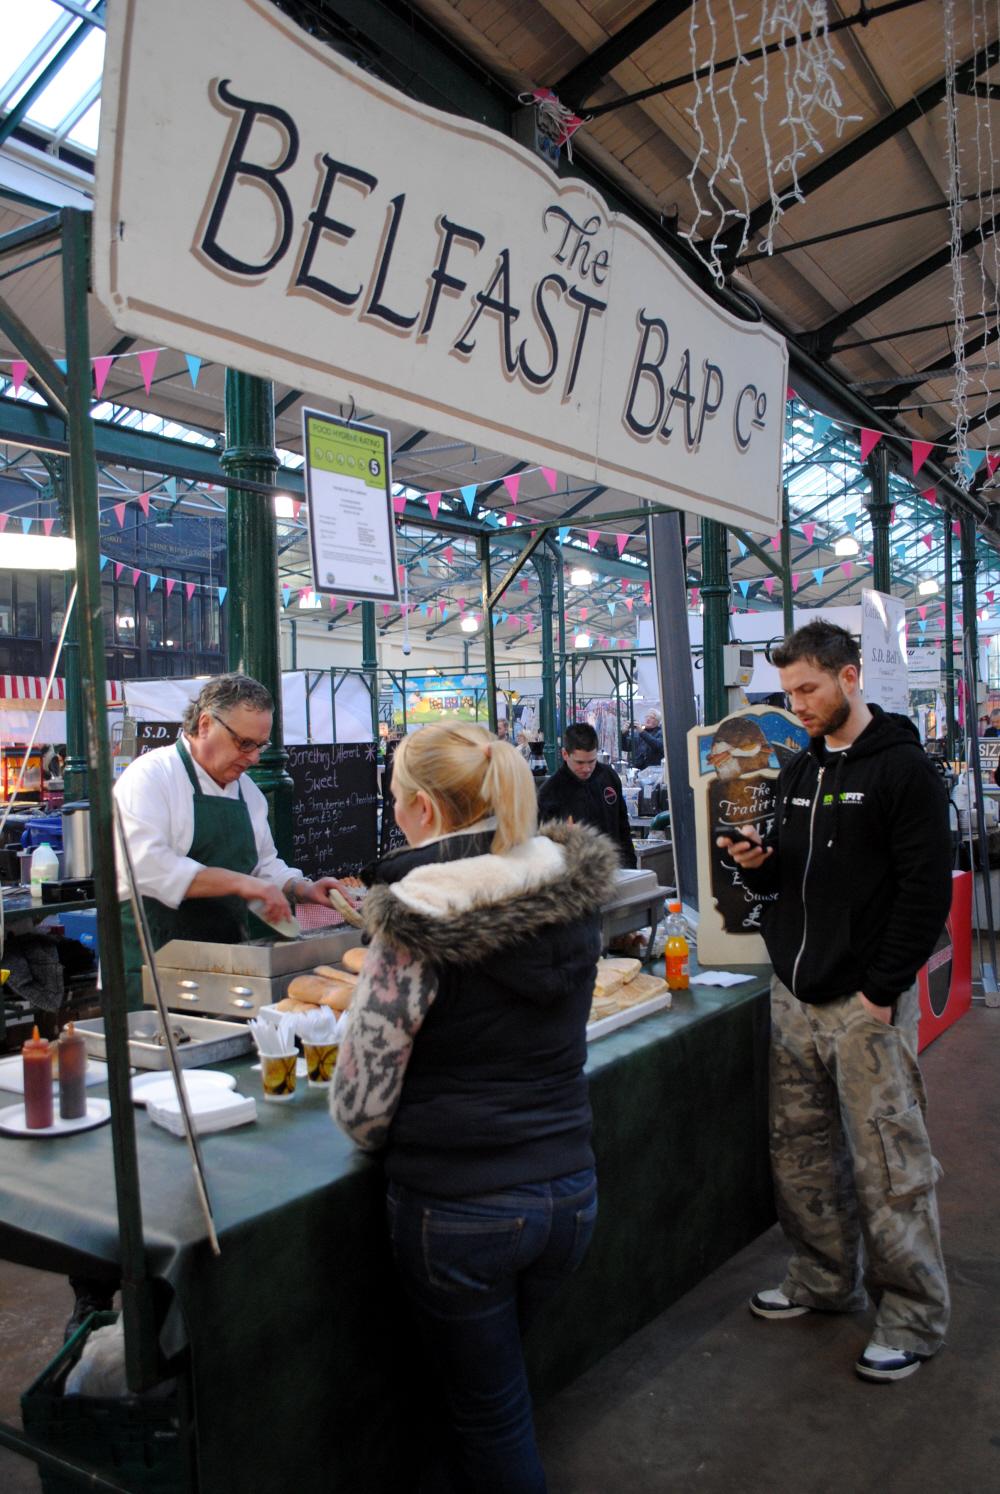 A Belfast Bap, anyone?